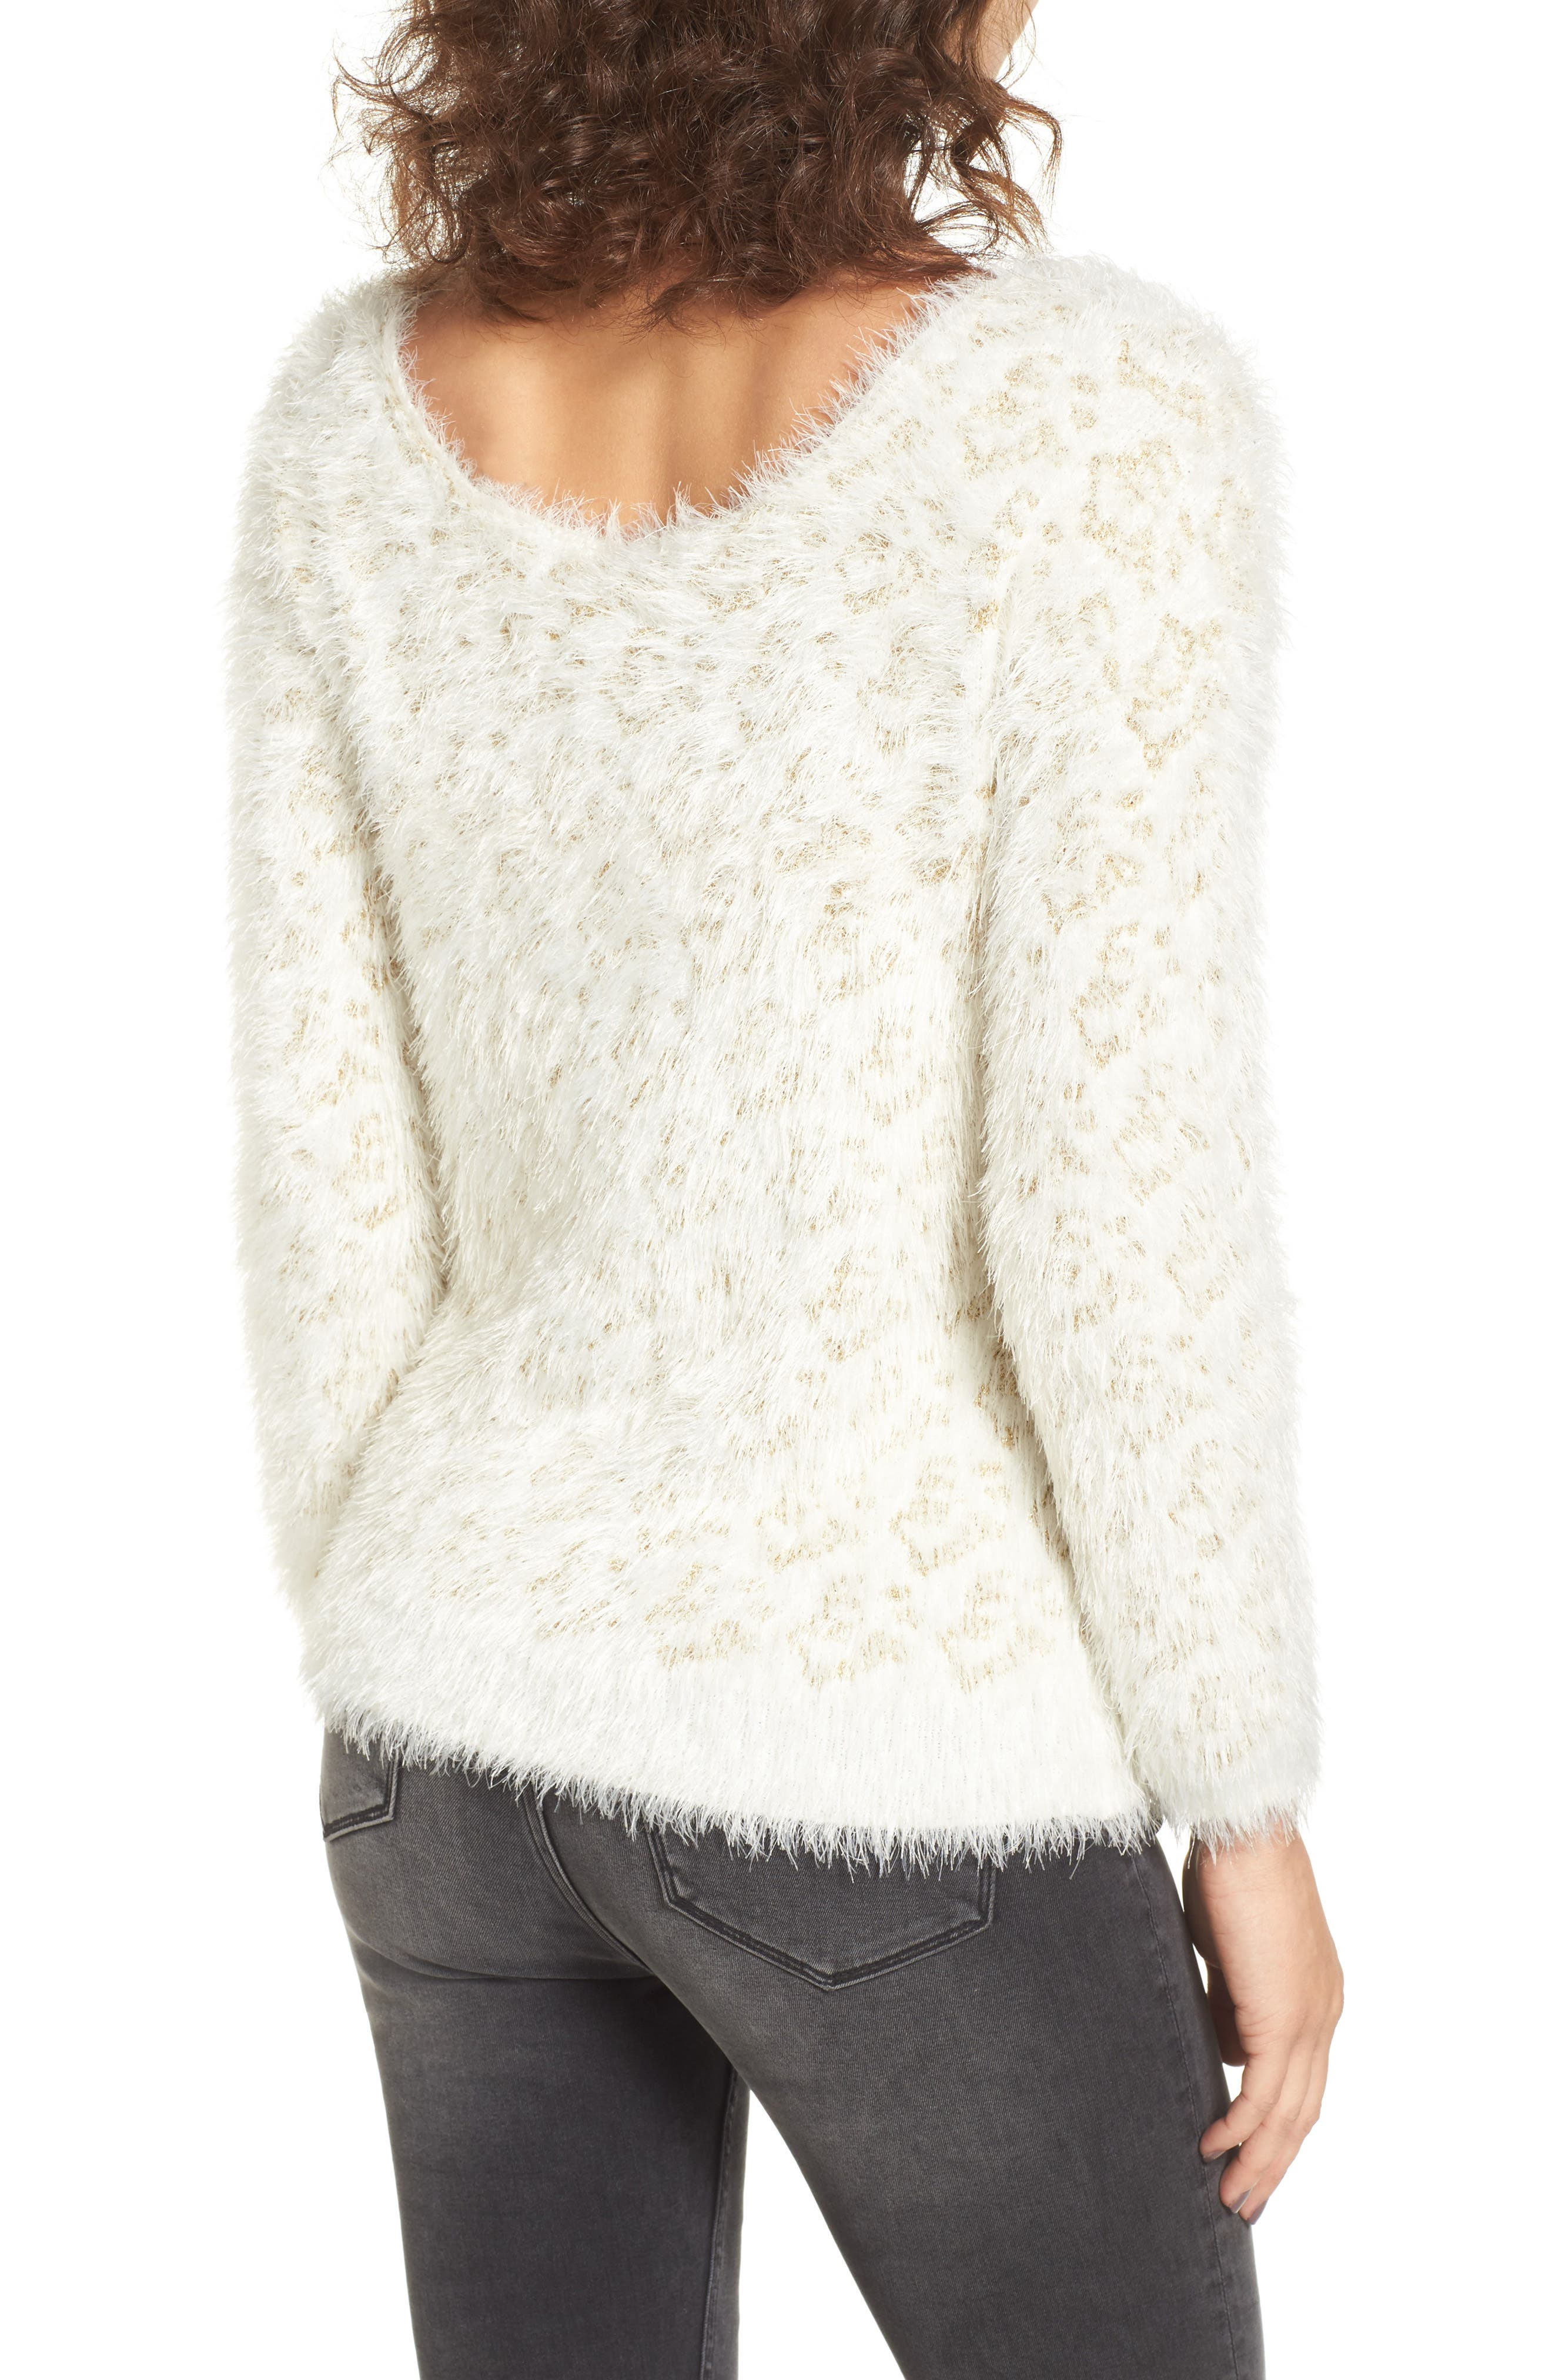 Cassidy Fuzzy Eyelash Sweater,                             Alternate thumbnail 2, color,                             710